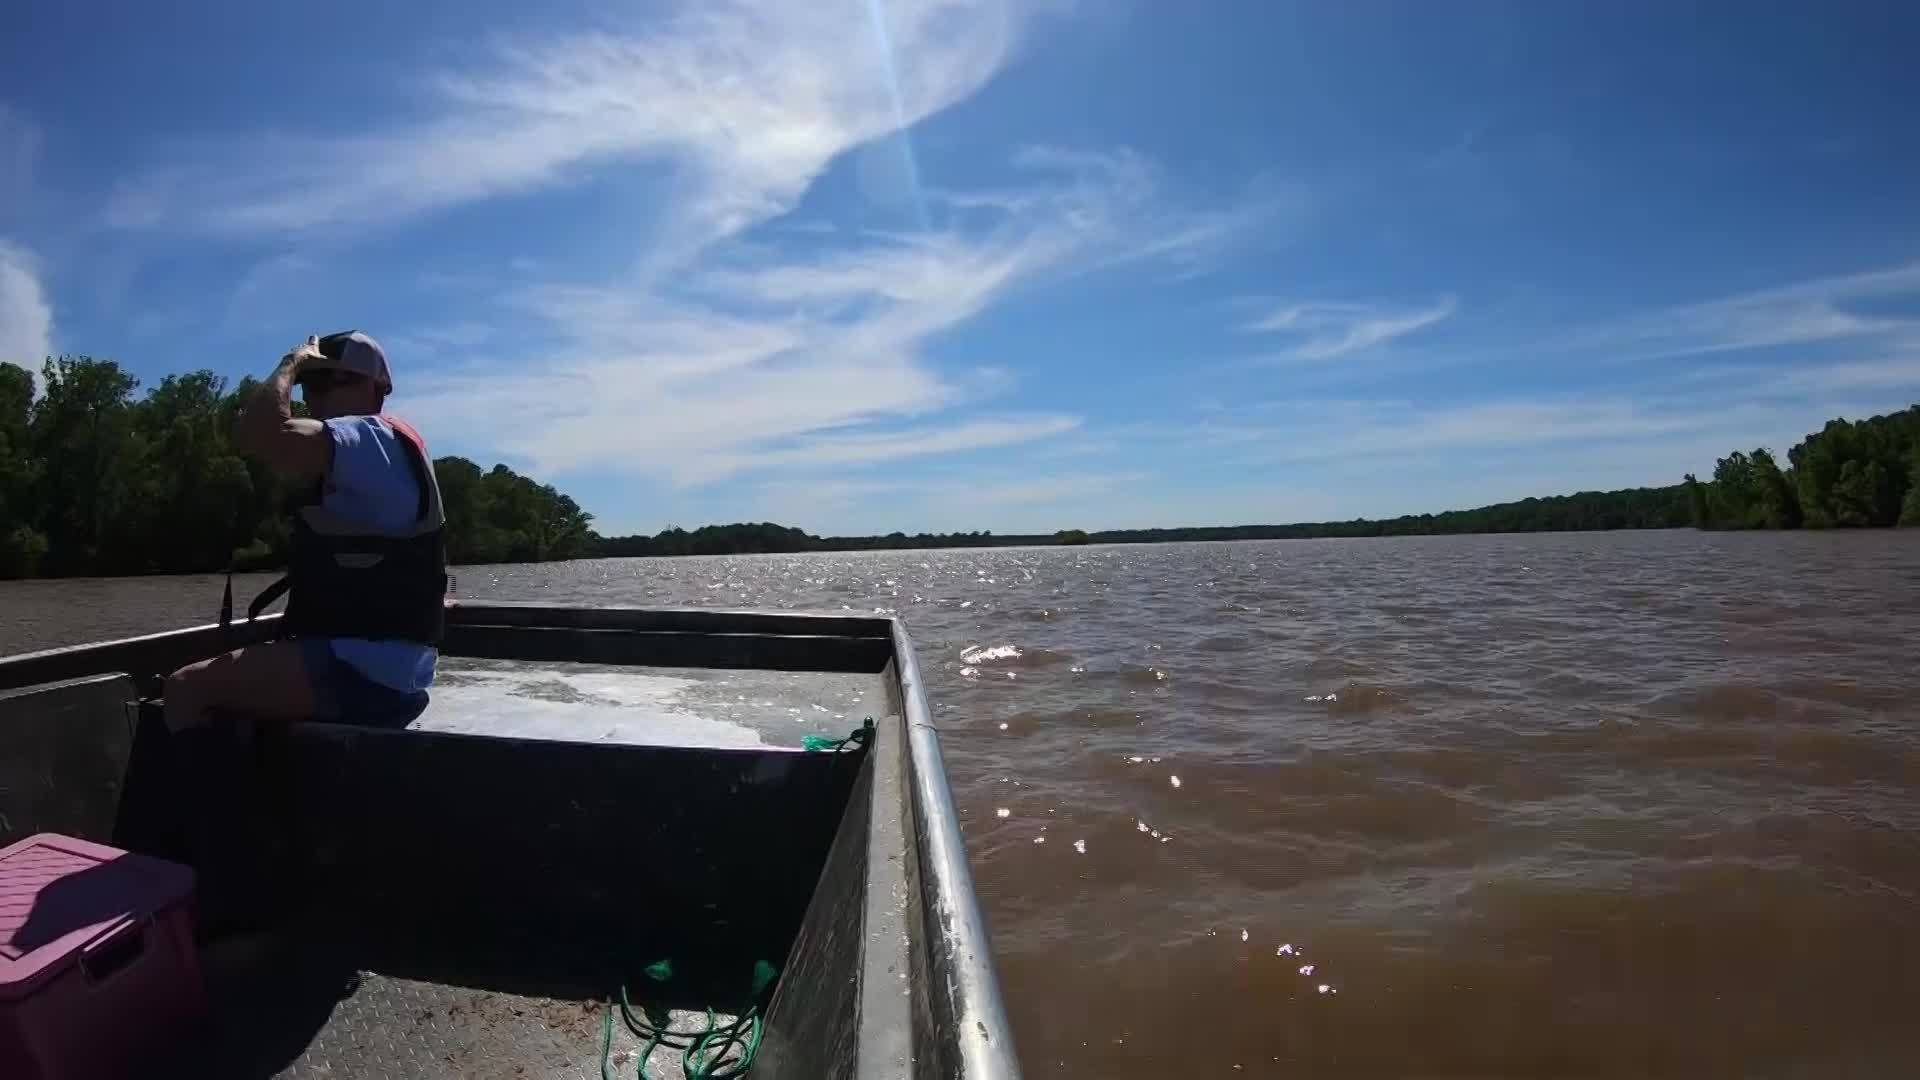 Wright__Arkansas_flood_victim_goes_back__7_20190611203208-118809306